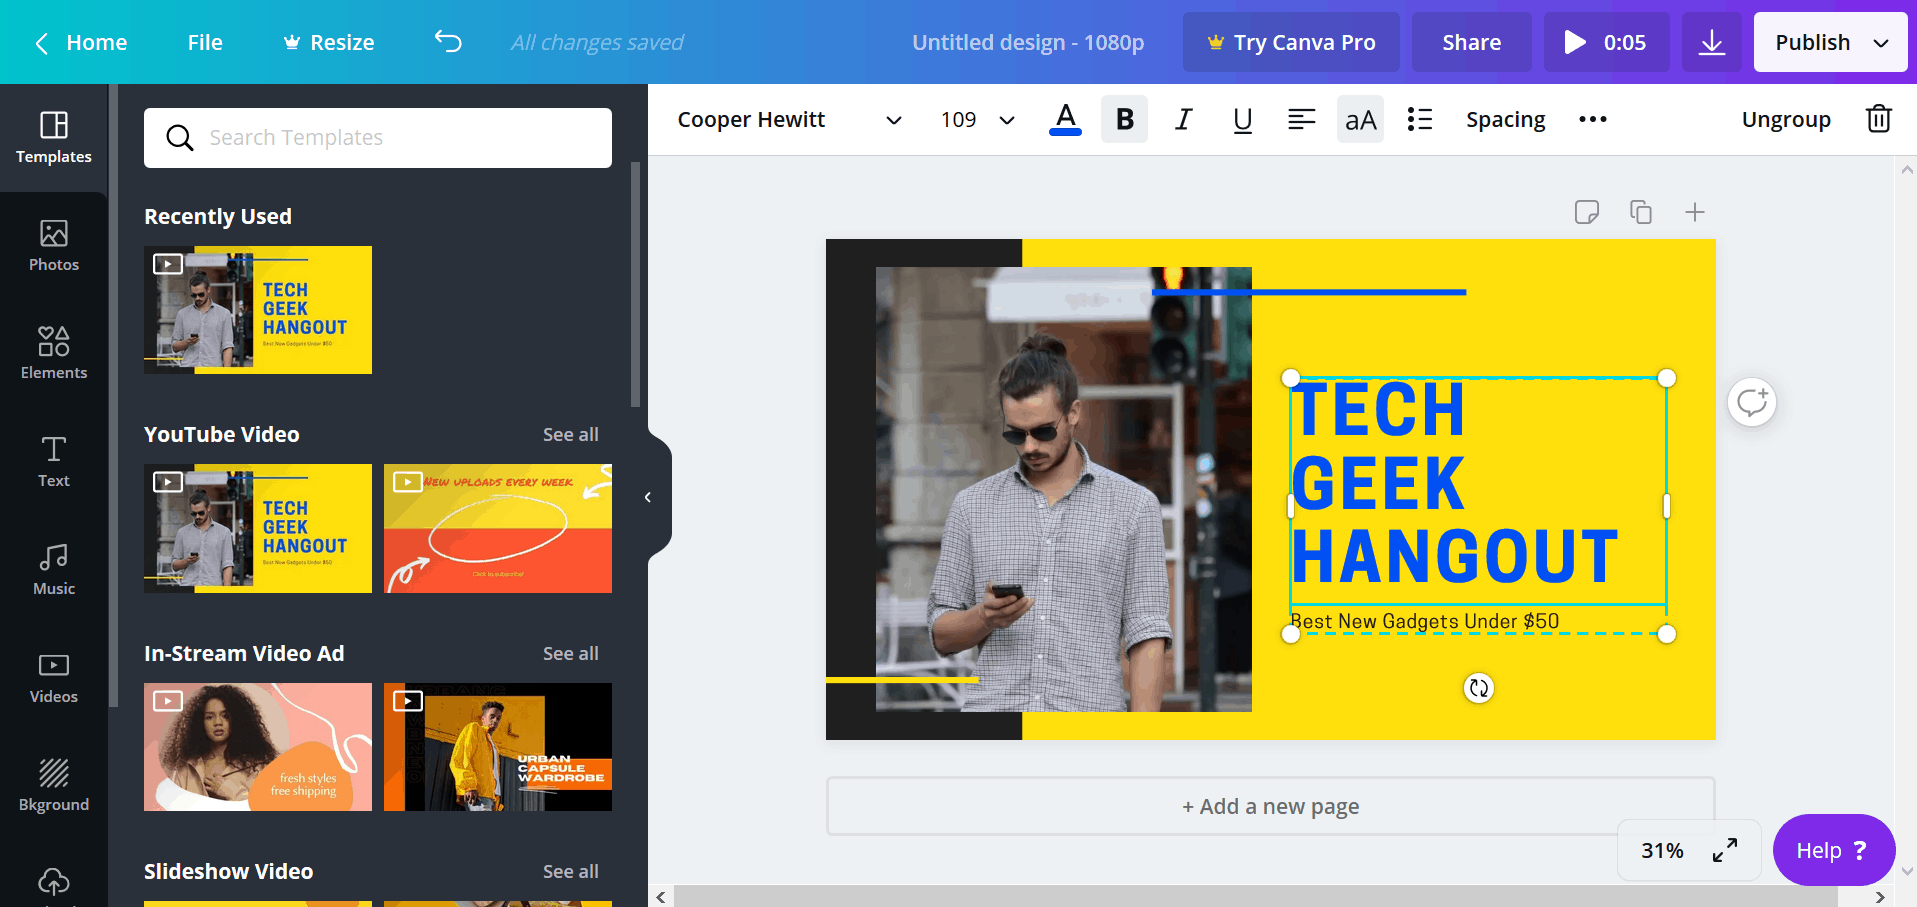 C:\Users\Tomer\Desktop\Canva Video.png